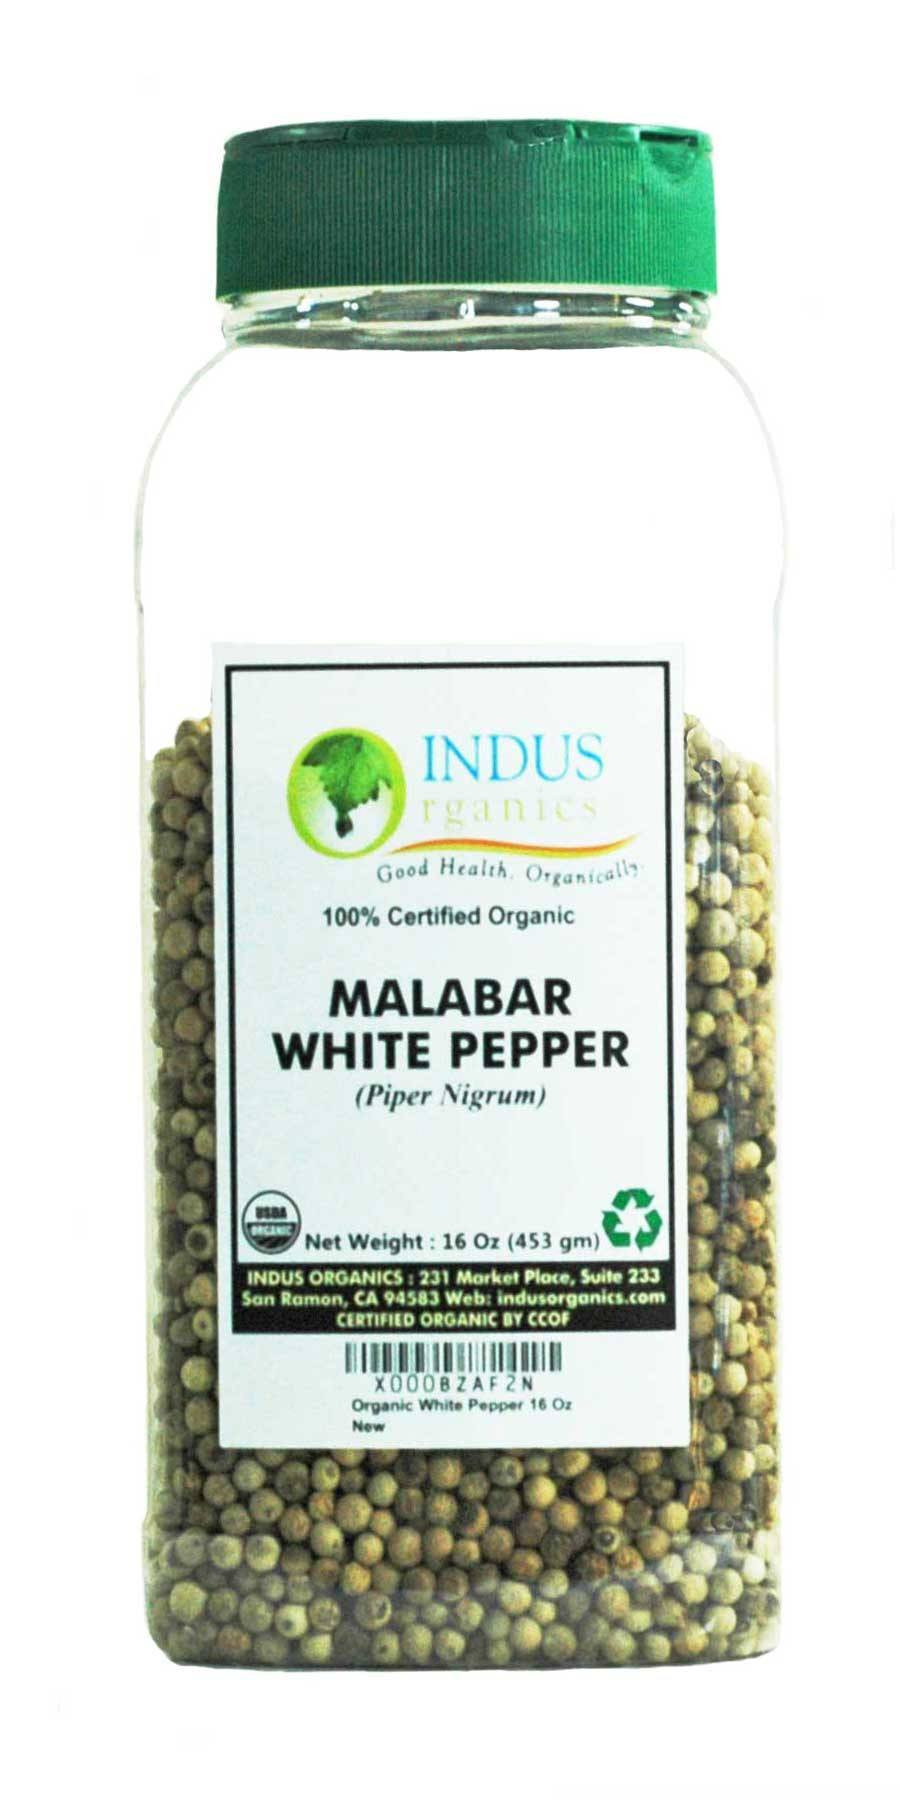 100% Organic White Peppercorns (Malabar) by Indus Organics